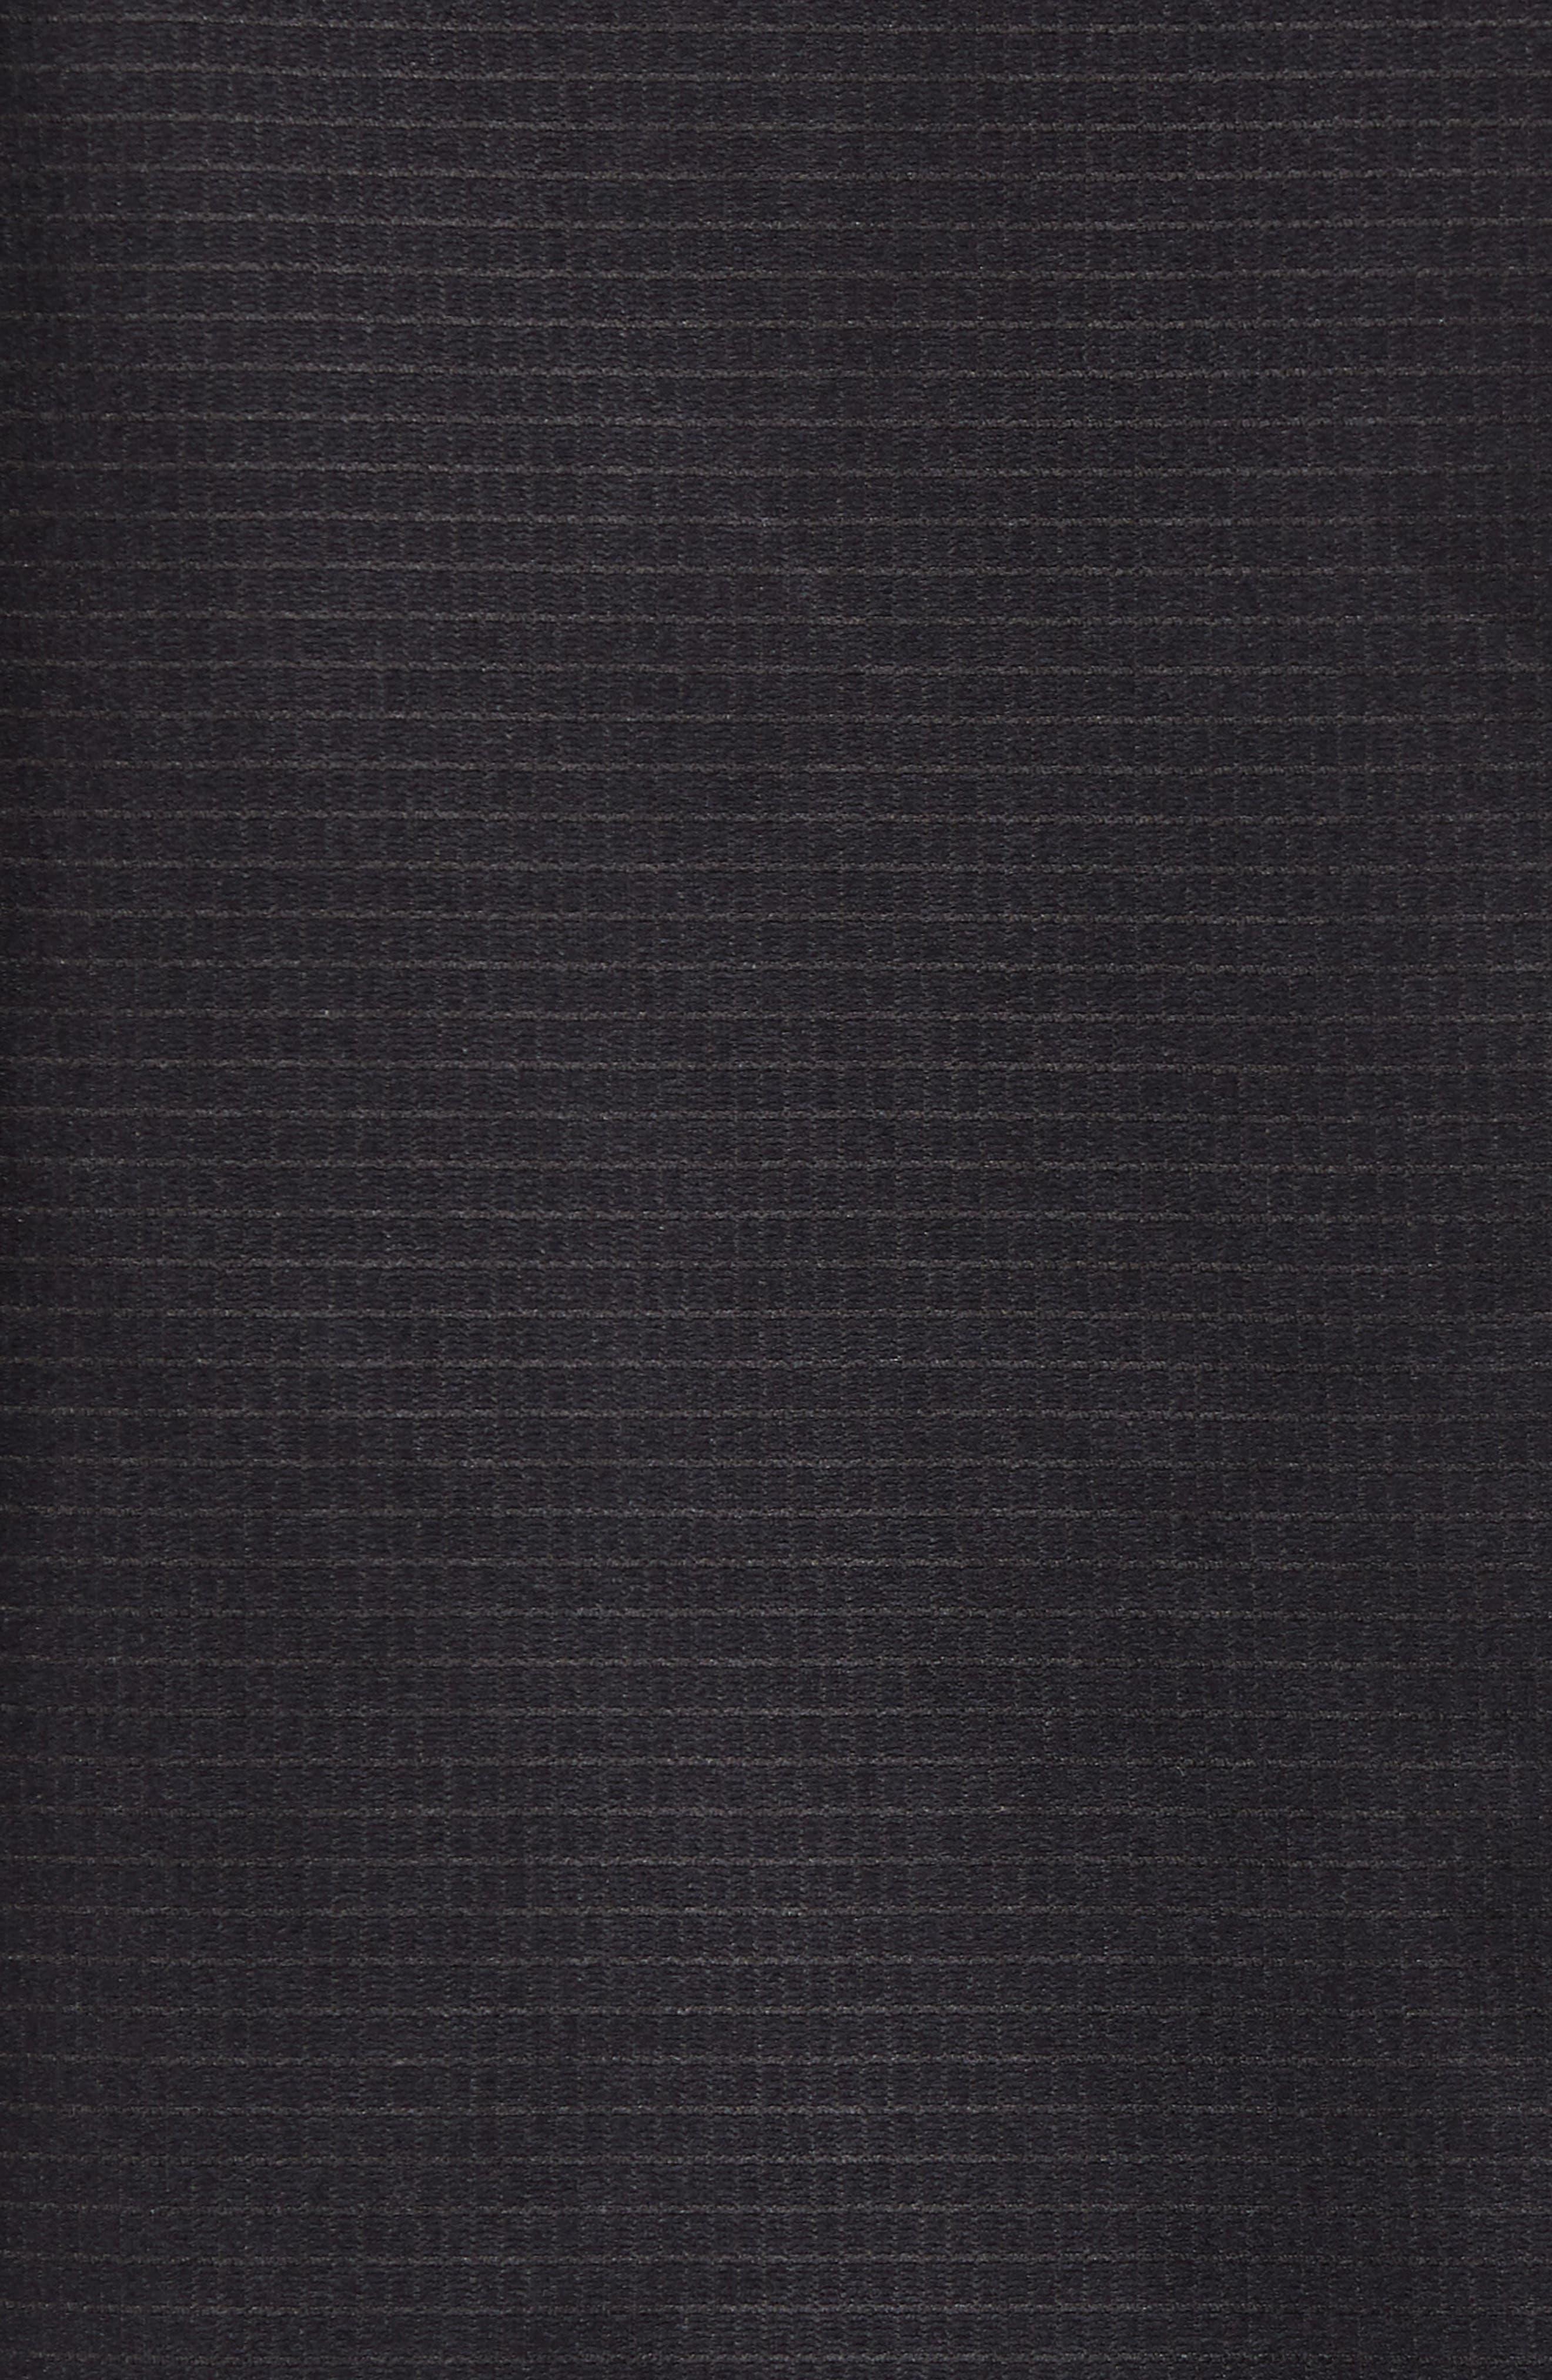 Ampere Zip Front Fleece Hoodie,                             Alternate thumbnail 5, color,                             Black